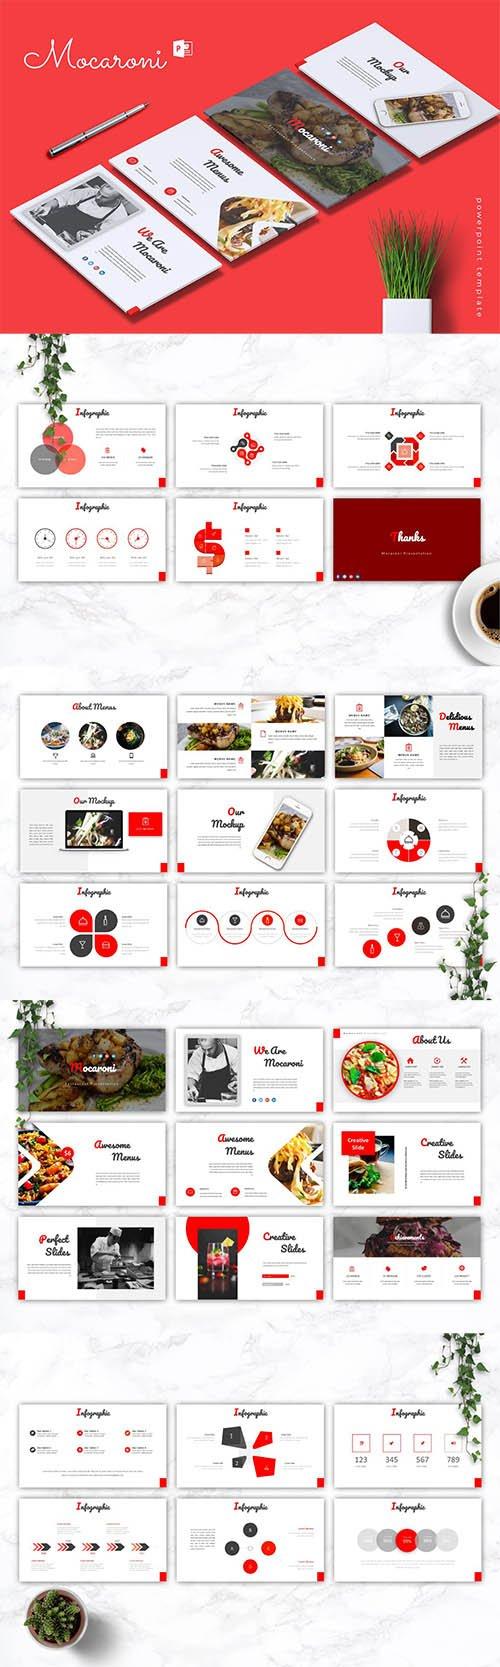 MOCARONI - Powerpoint, Keynote and Google Slides Templates